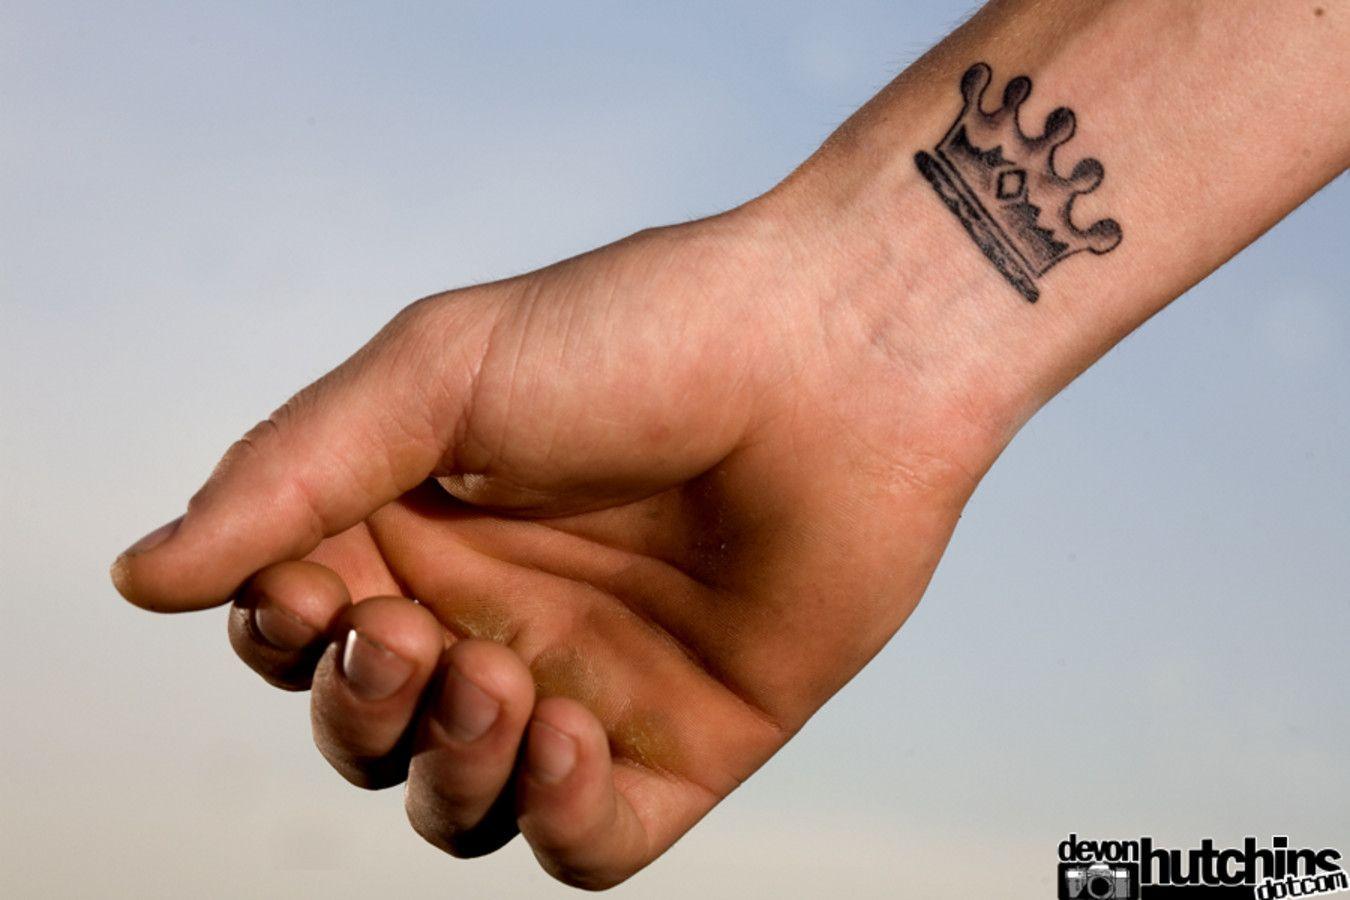 Small christian tattoo ideas for men small tattoo  tattoos  pinterest  small tattoo tattoo and body art